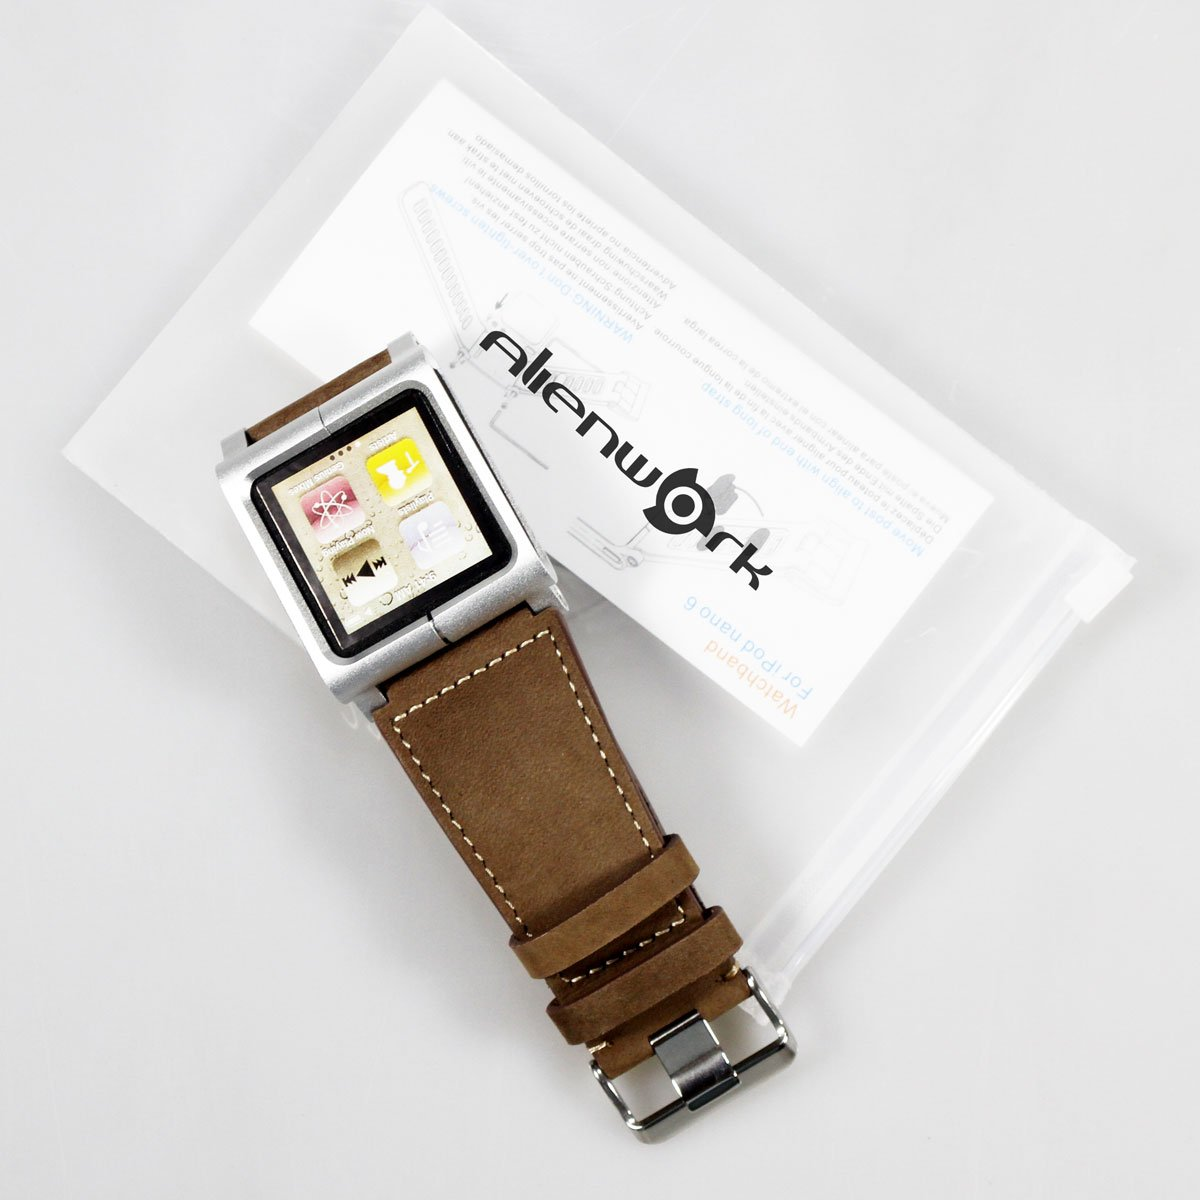 4f35fbdba0dea Alienwork Pod2Watch Armband für iPod nano 6 Watchband Uhr-Kits Aluminium  braun AN608-02